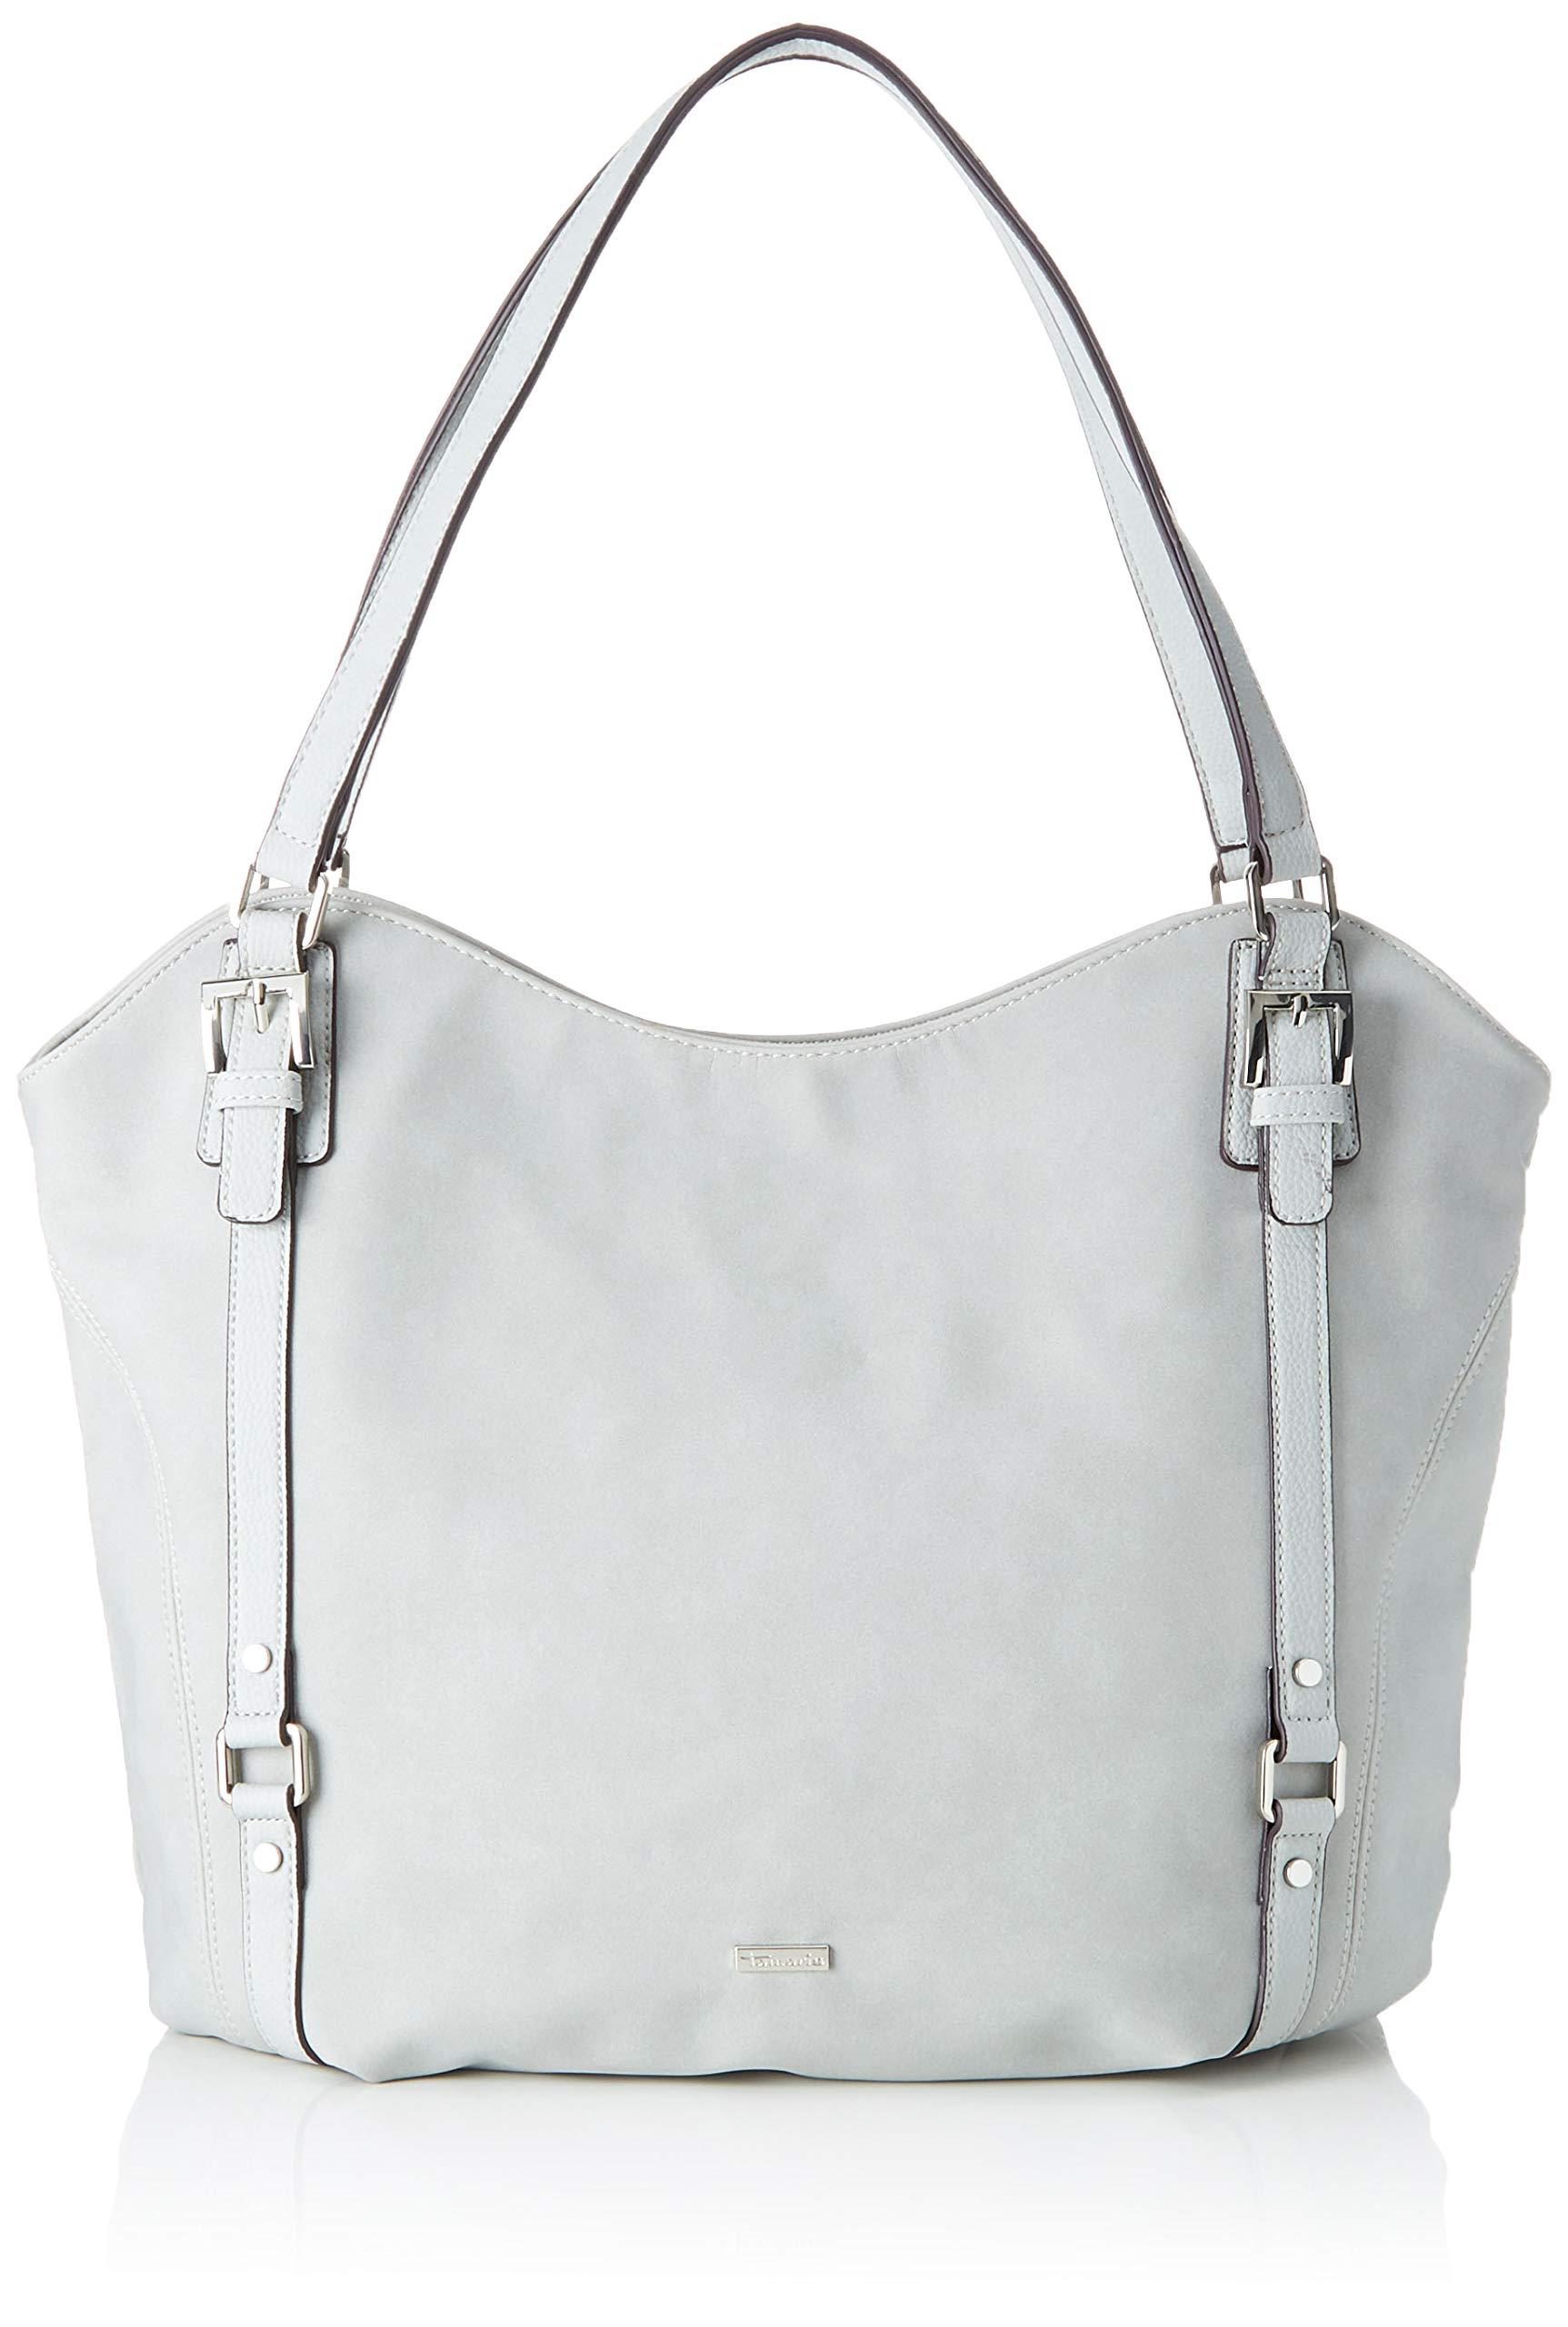 Tamaris FemmeGrislight X Malou H Shopping L Grey BagSac Comb15x33x48 Cmw BtdshQrCx